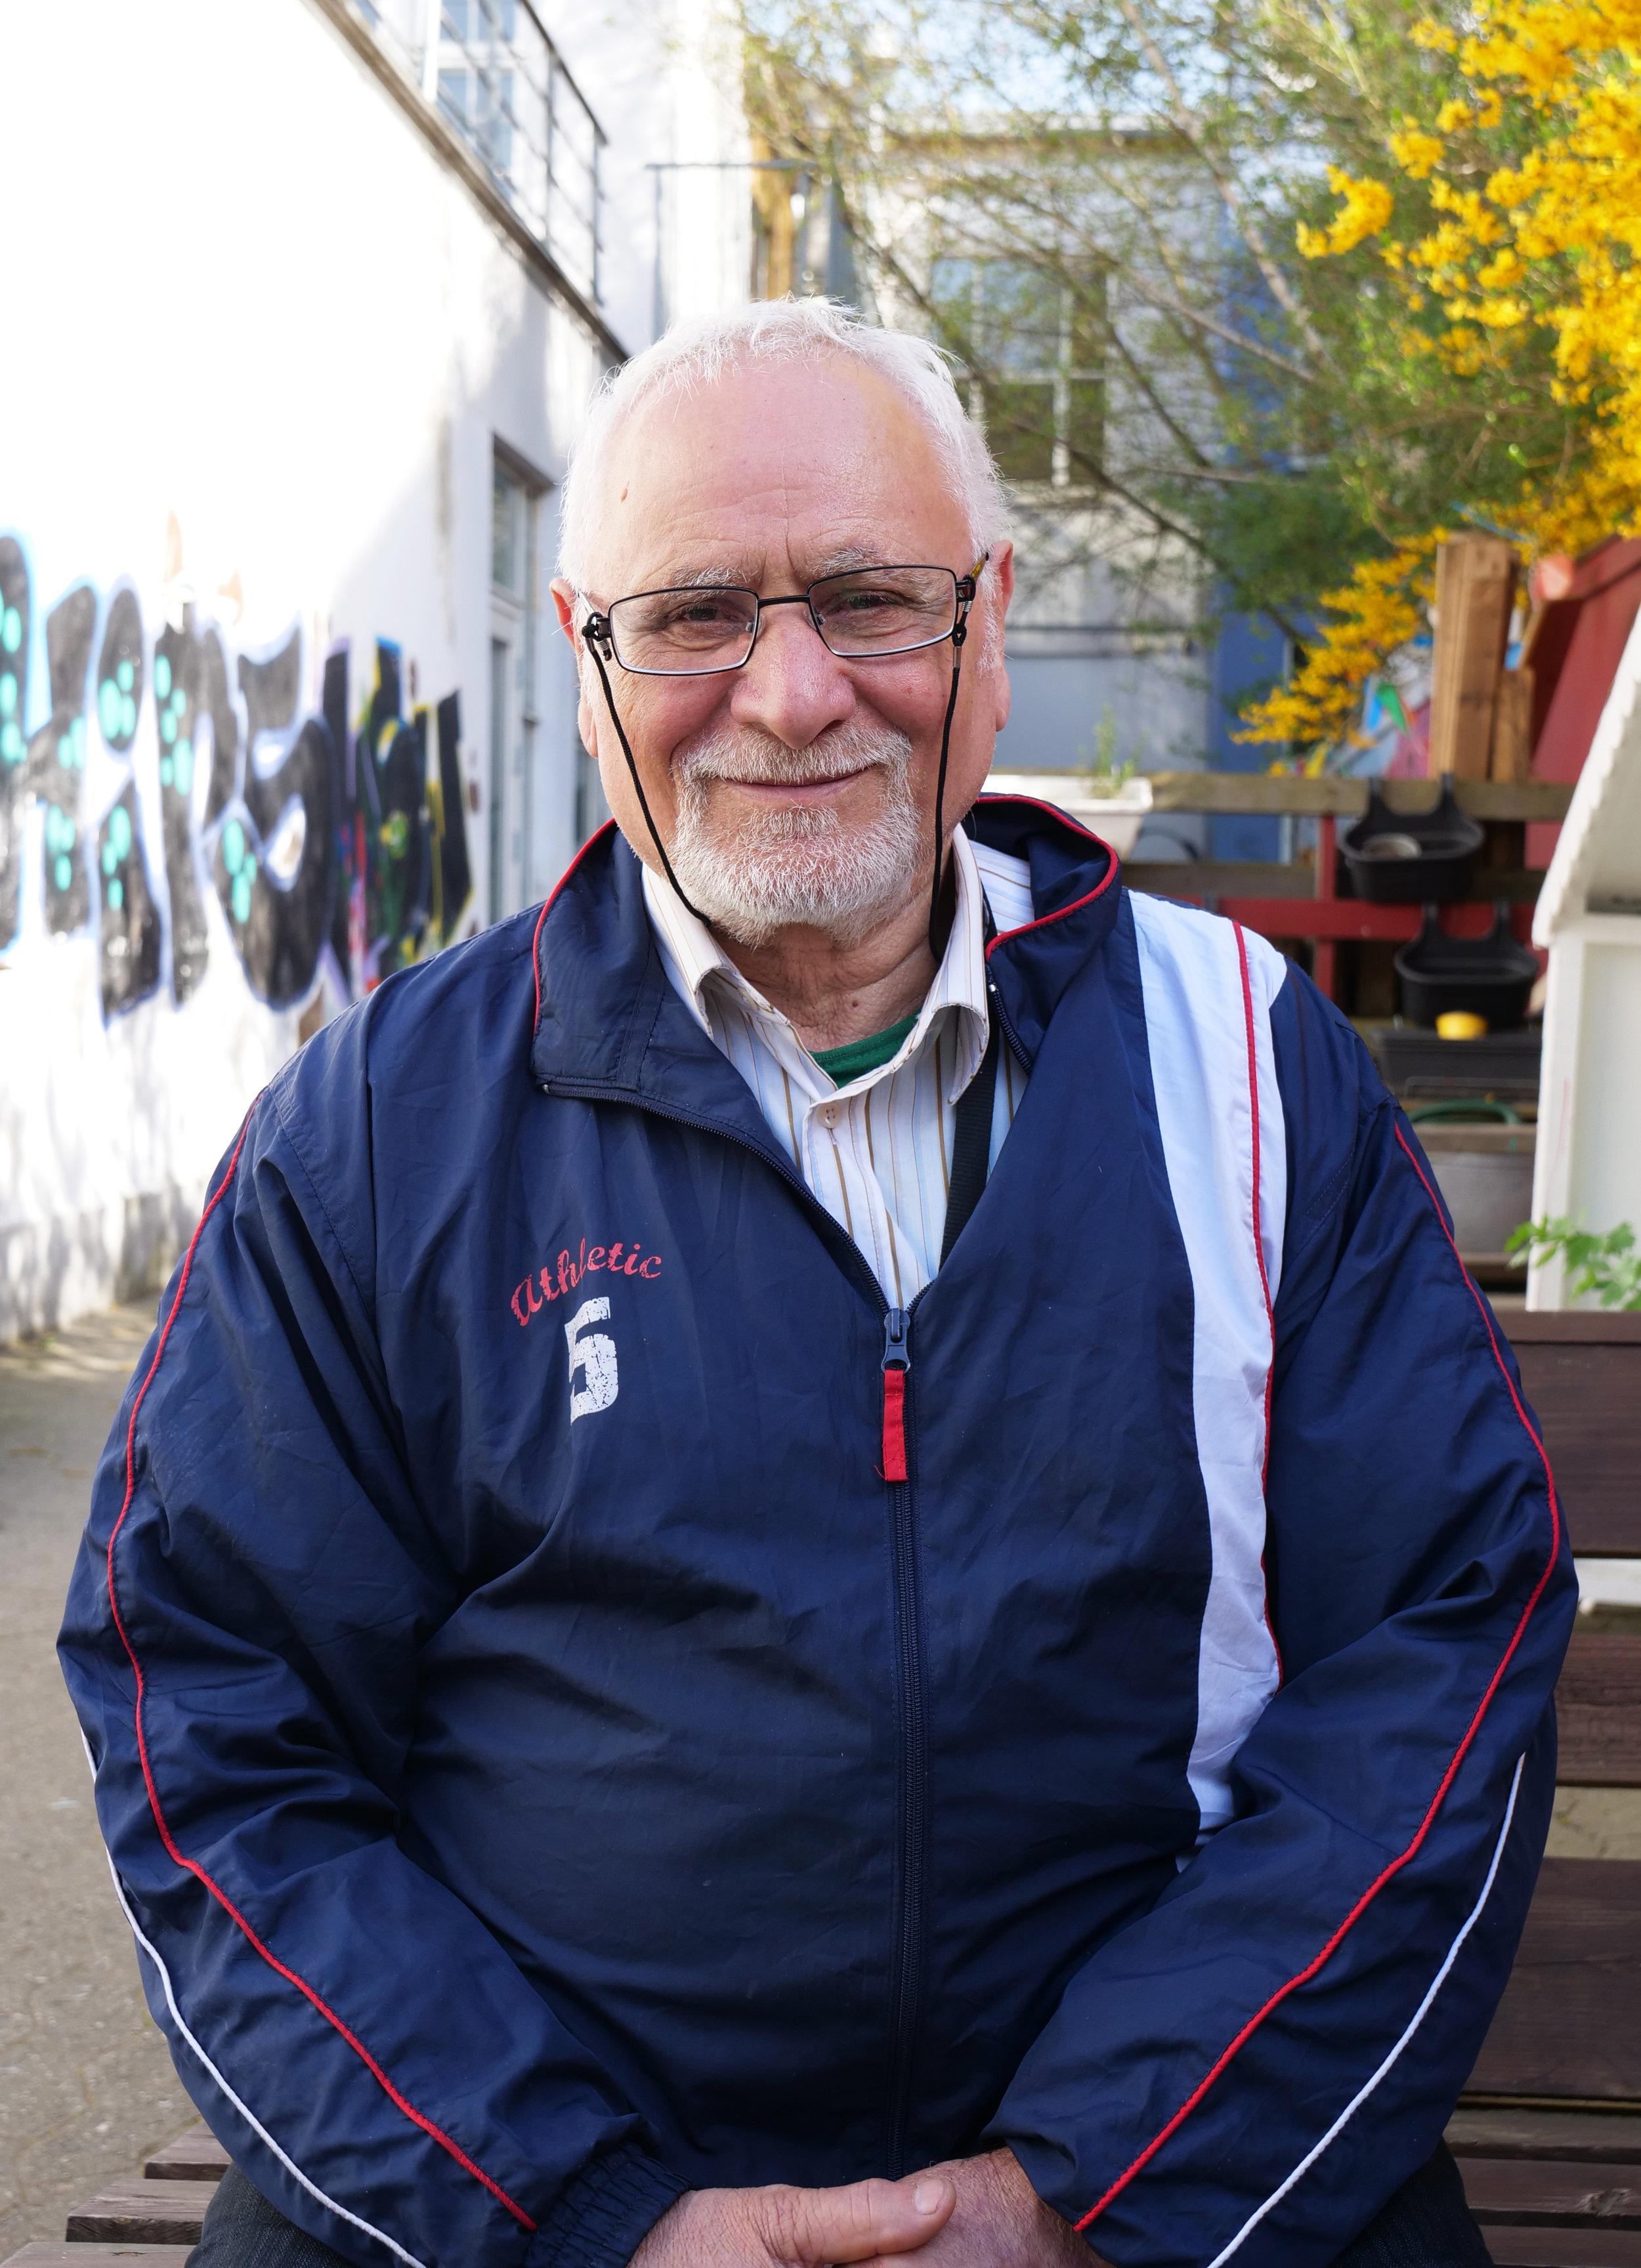 Amir, 56, er i integrationsforløb i Trampolinhuset via et samarbejde med Roskilde Kommune. Foto: Viktoria Steinhart.